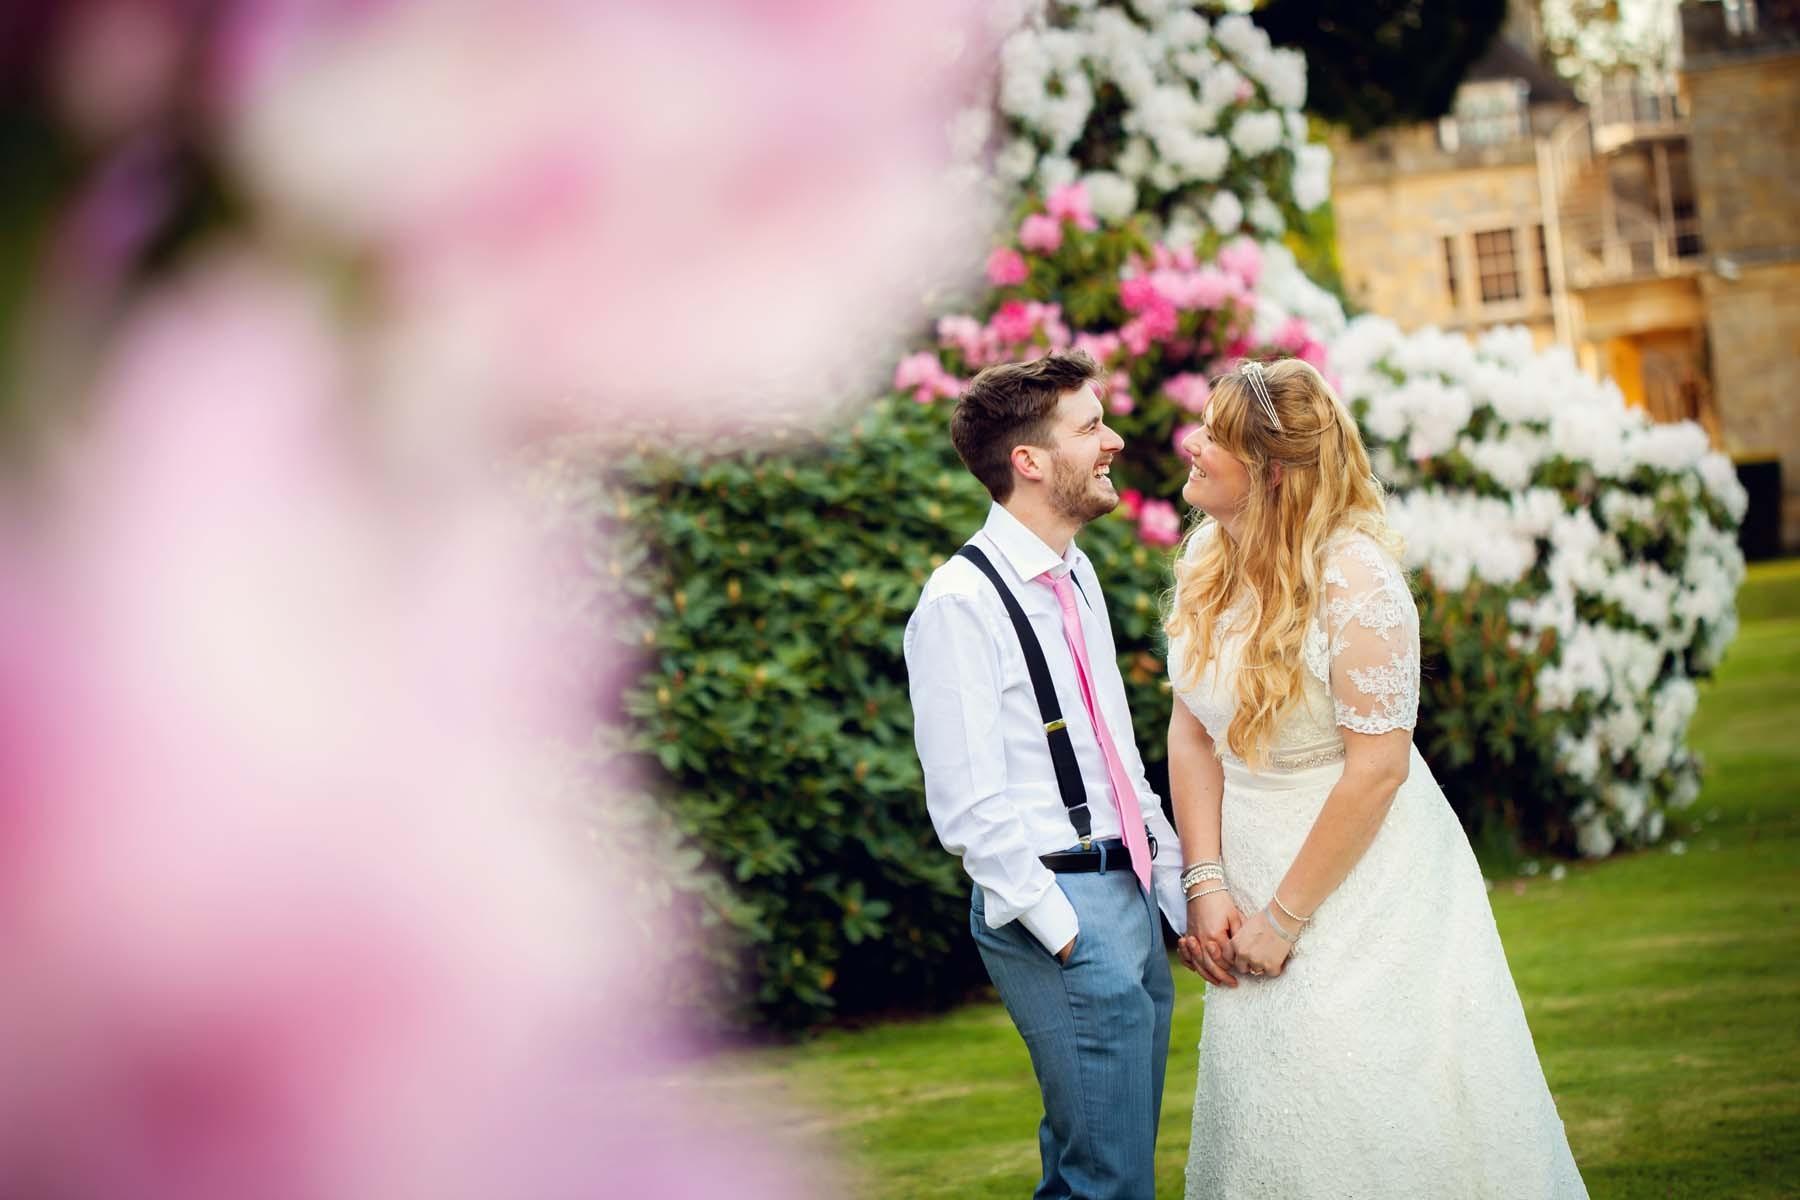 Sussex & Surrey Wedding Photographer - Bride & Groom (11)